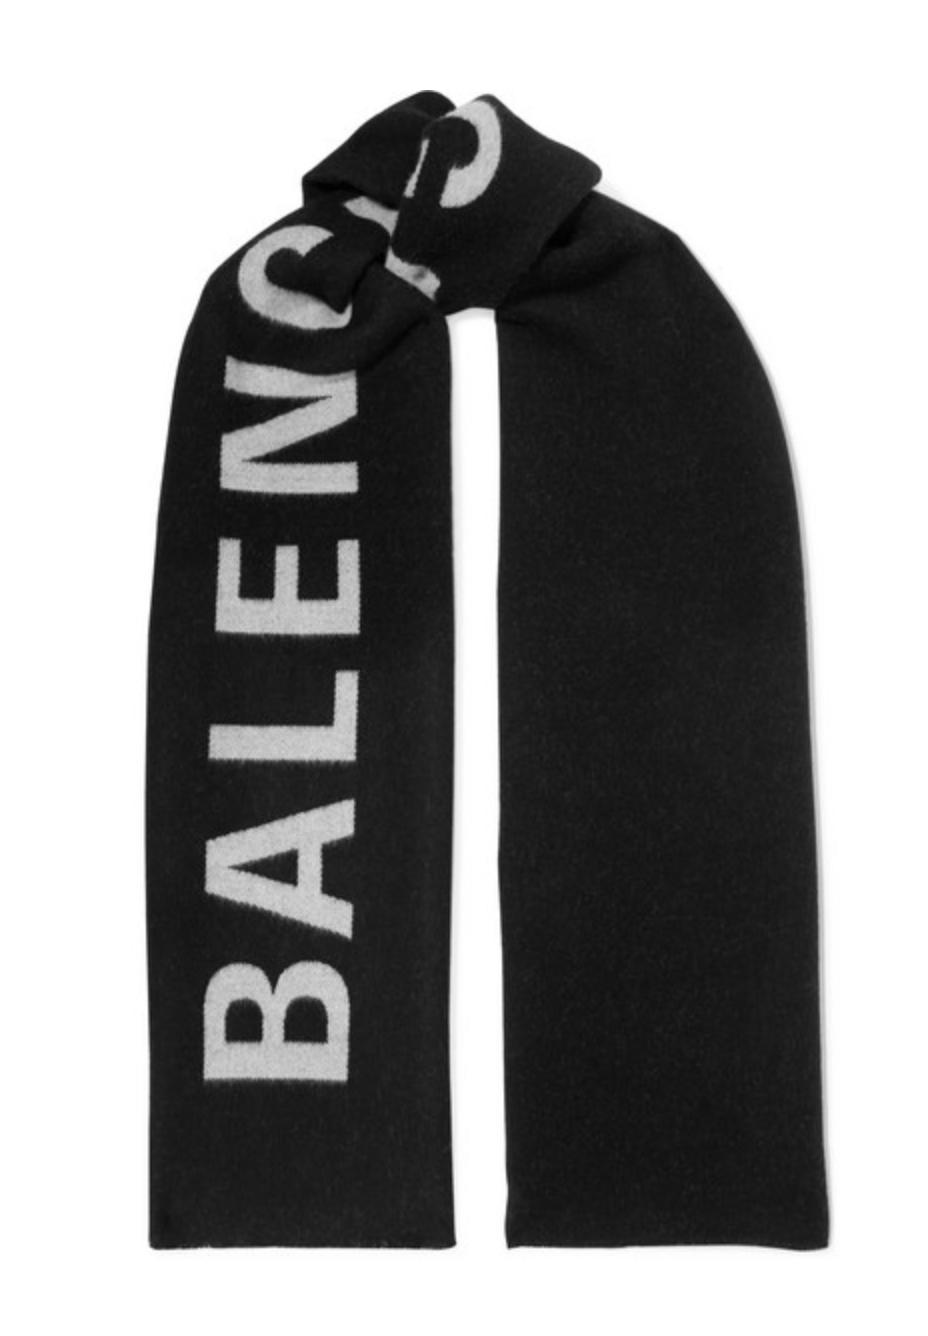 Balenciaga Wool Scarf - 495€